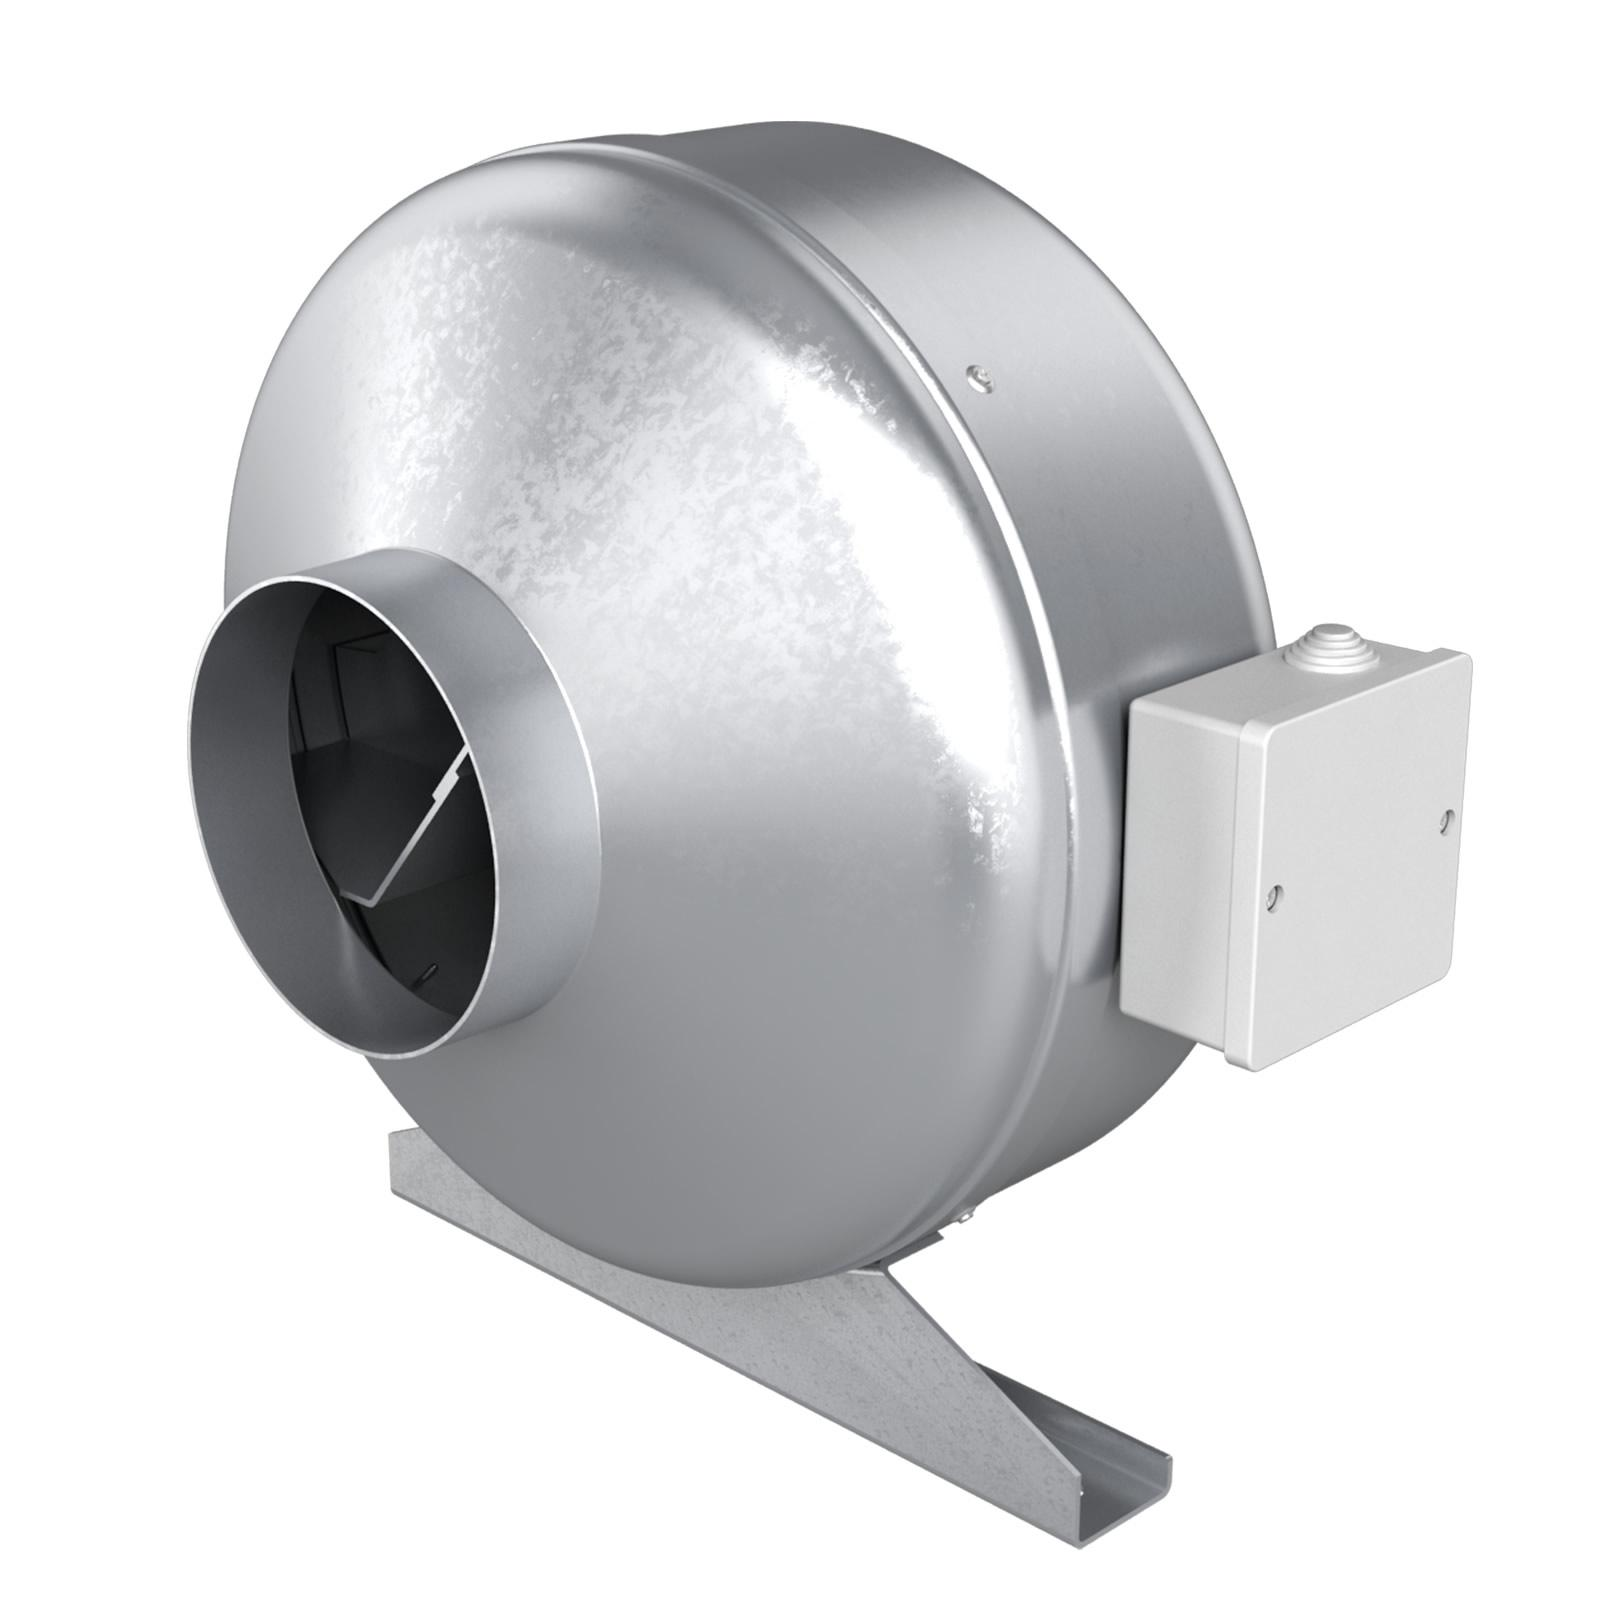 Вентилятор Era Mars gdf 200